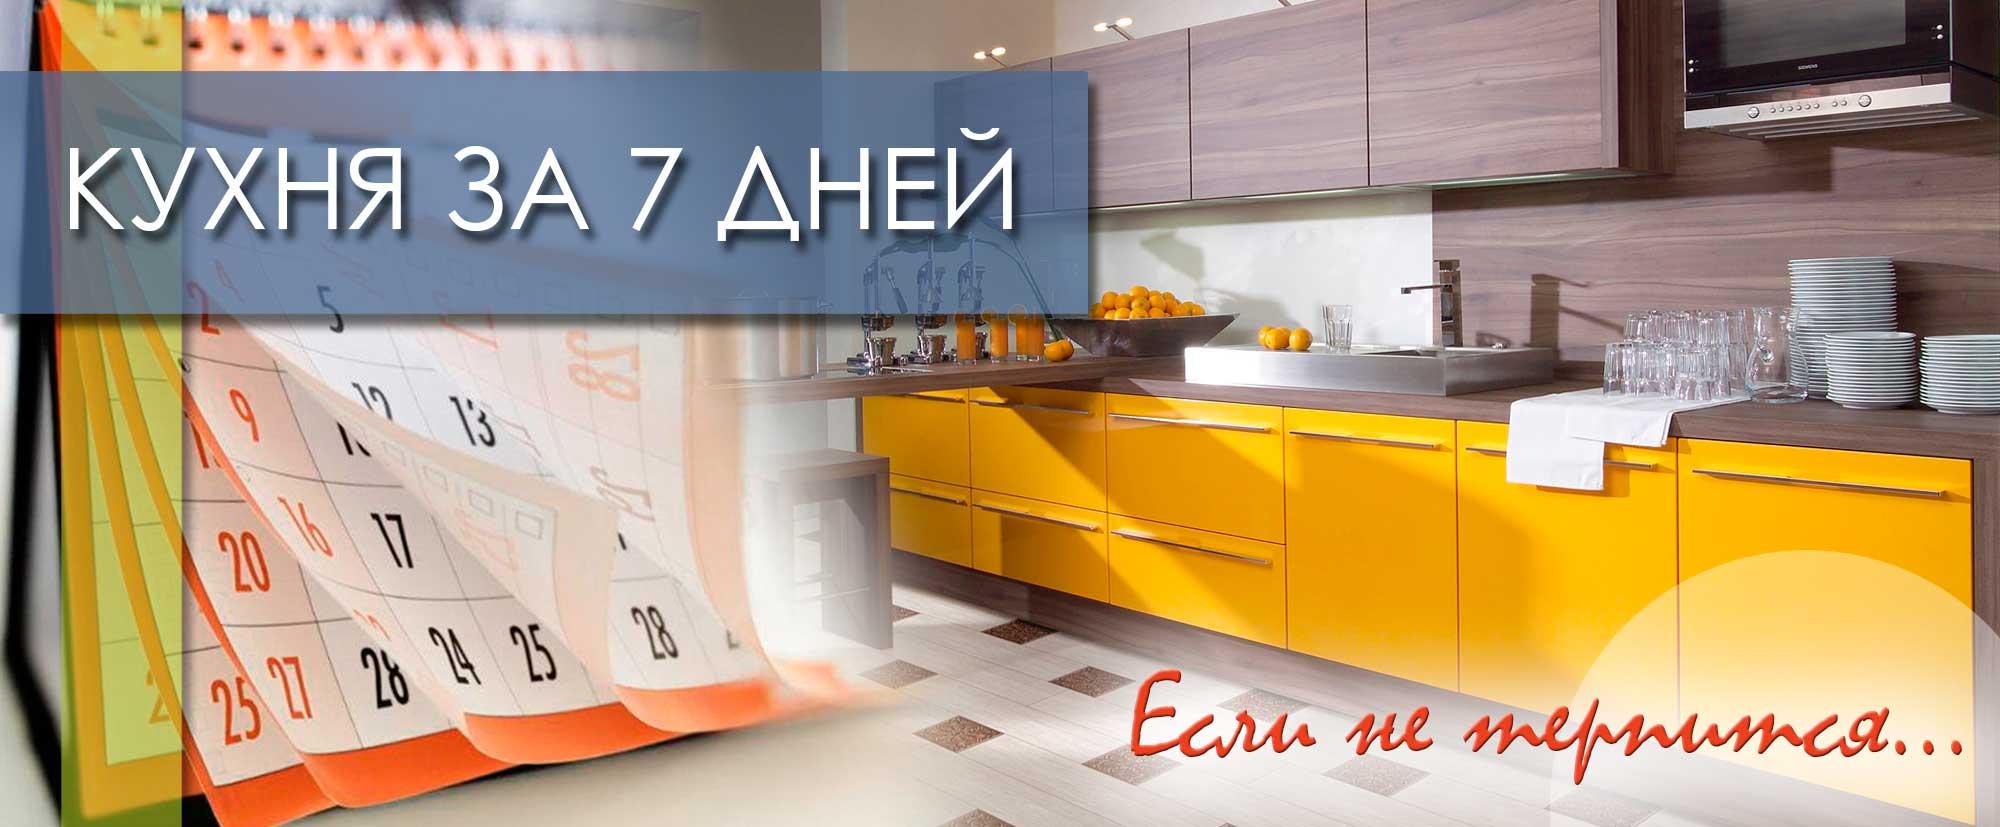 встроенная кухня за 7 дней